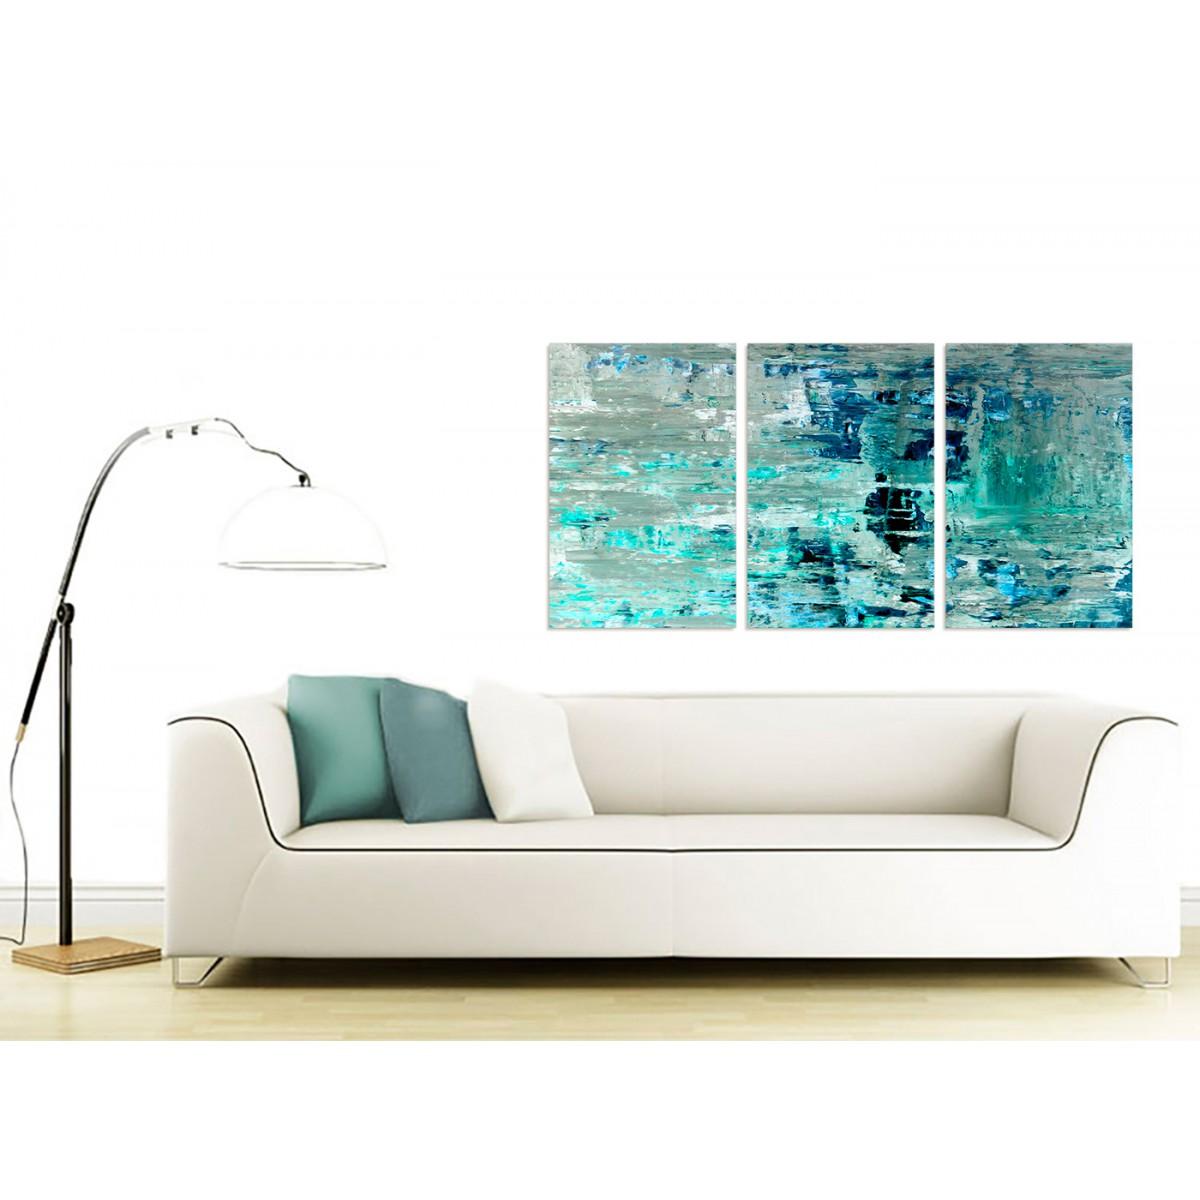 Turquoise Living Room Sofa